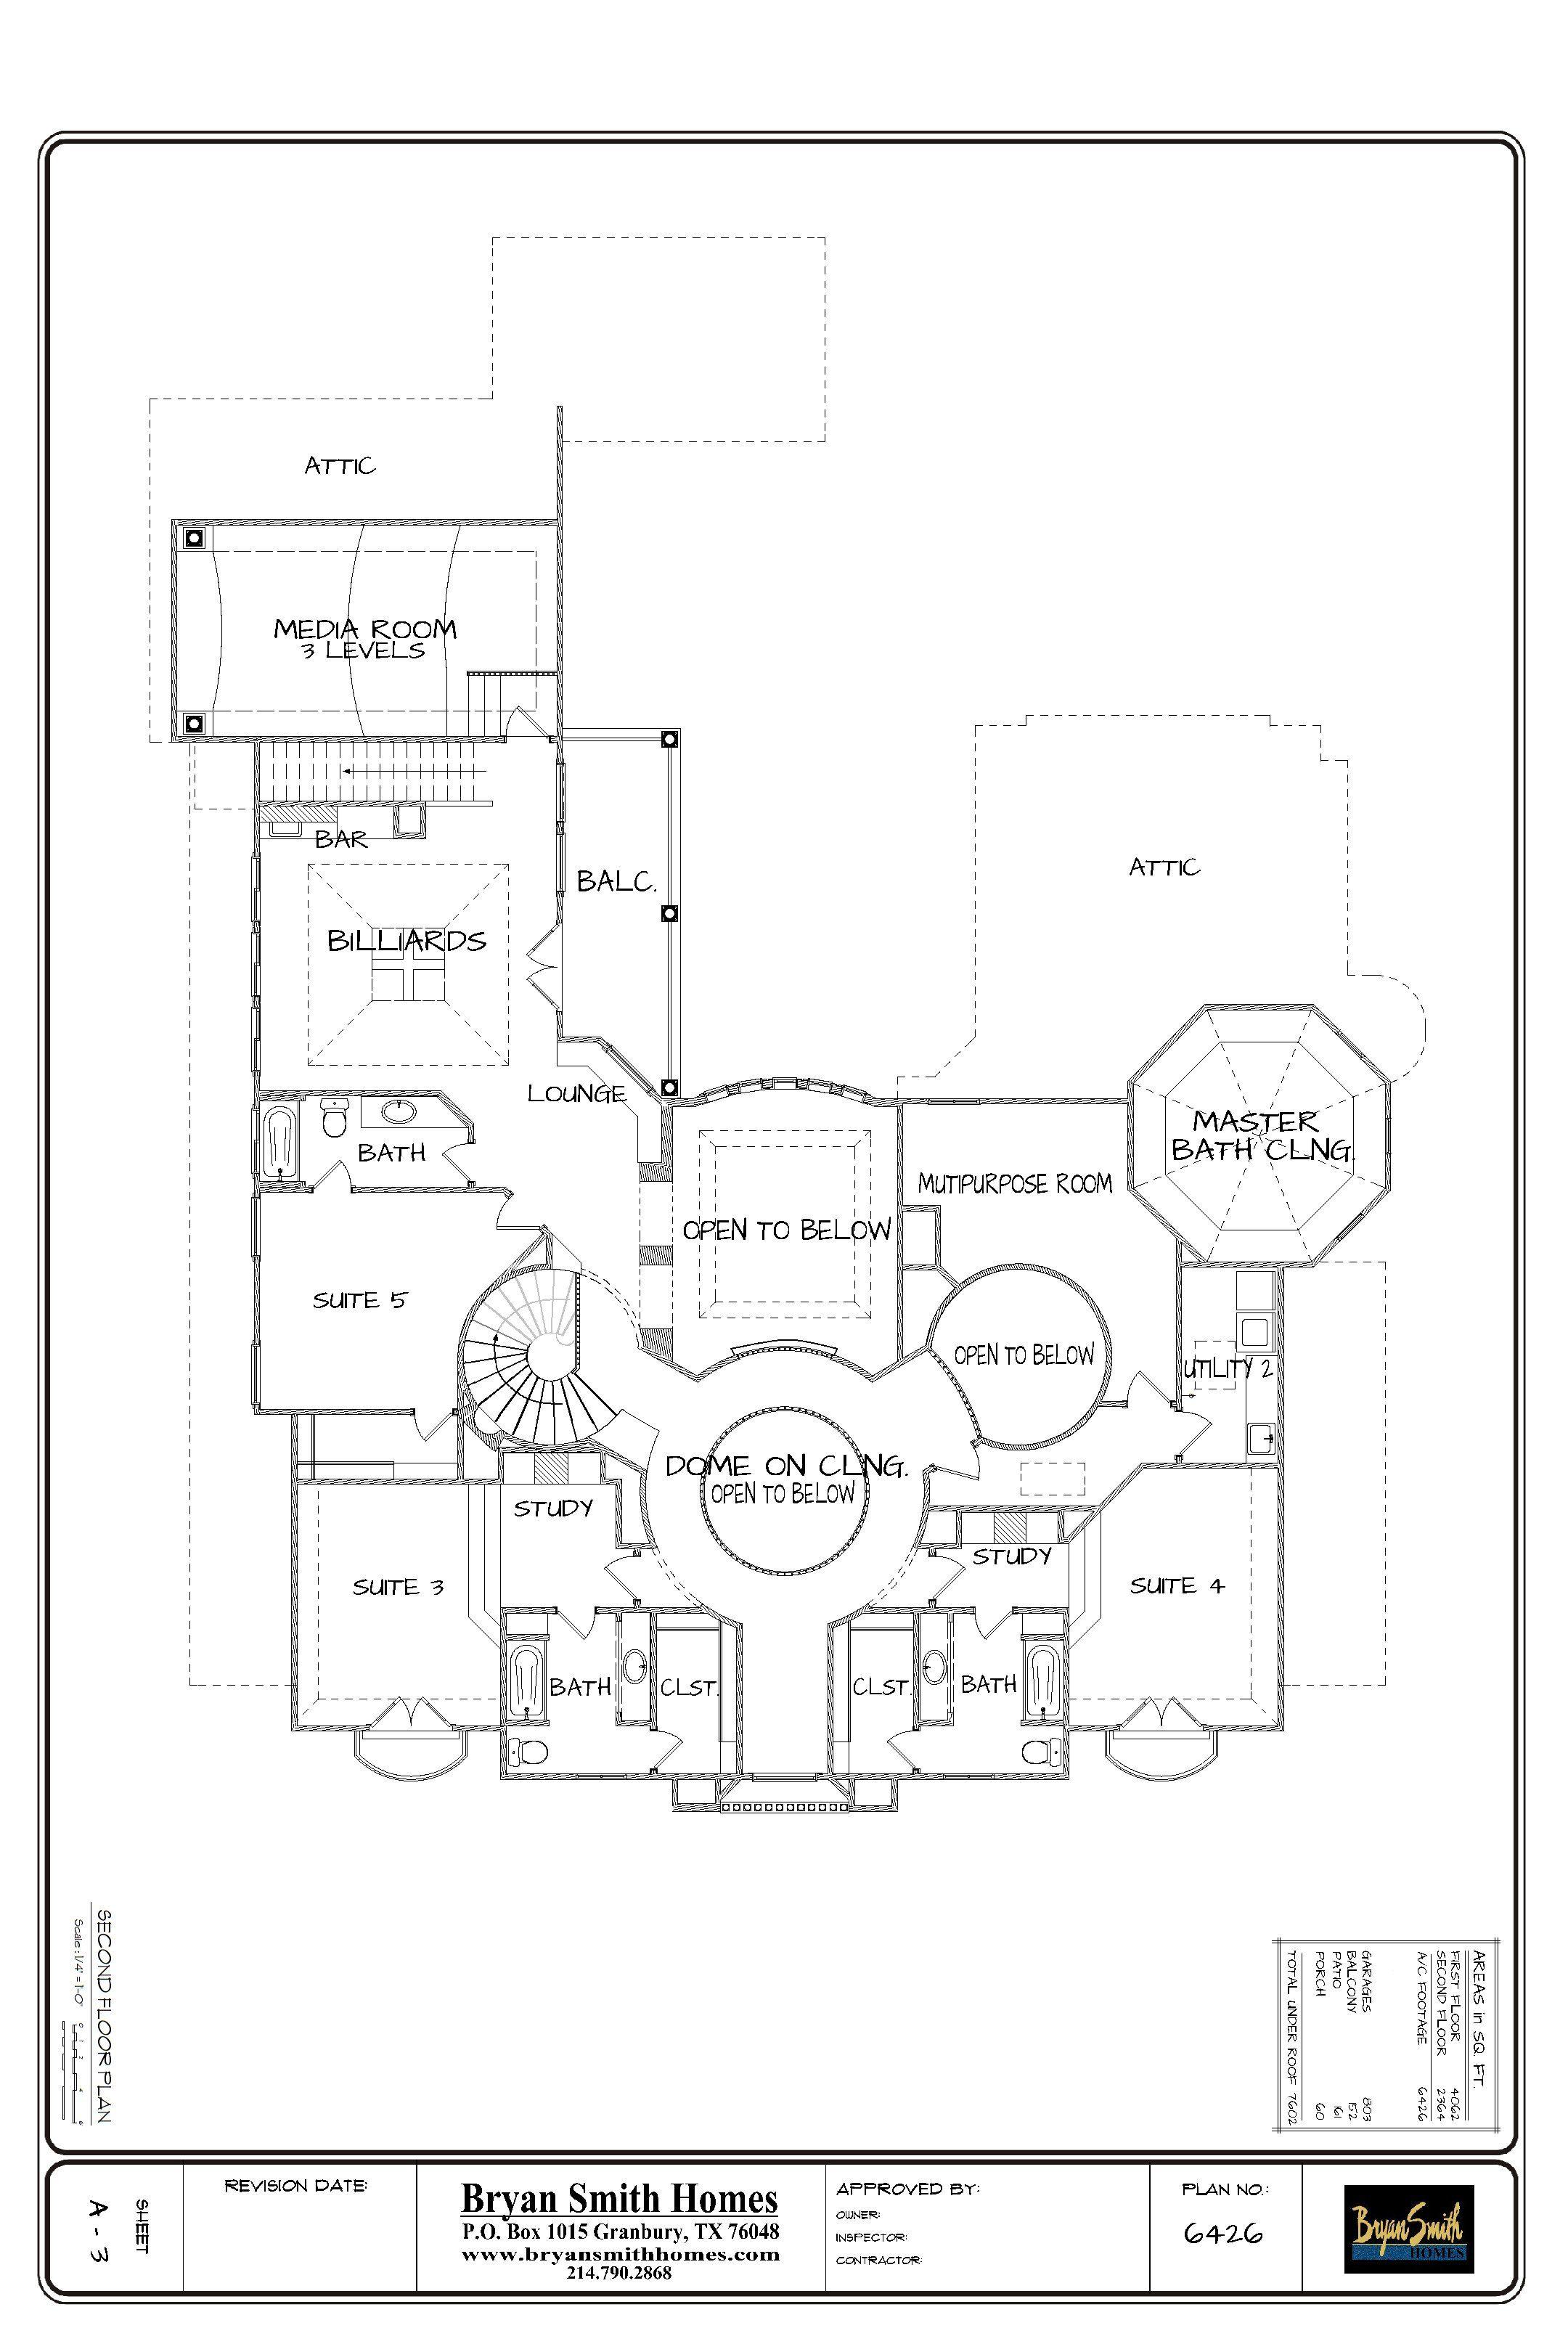 2nd floor presentation sheet for website house plans pinterest Victorian House 2nd floor presentation sheet for website